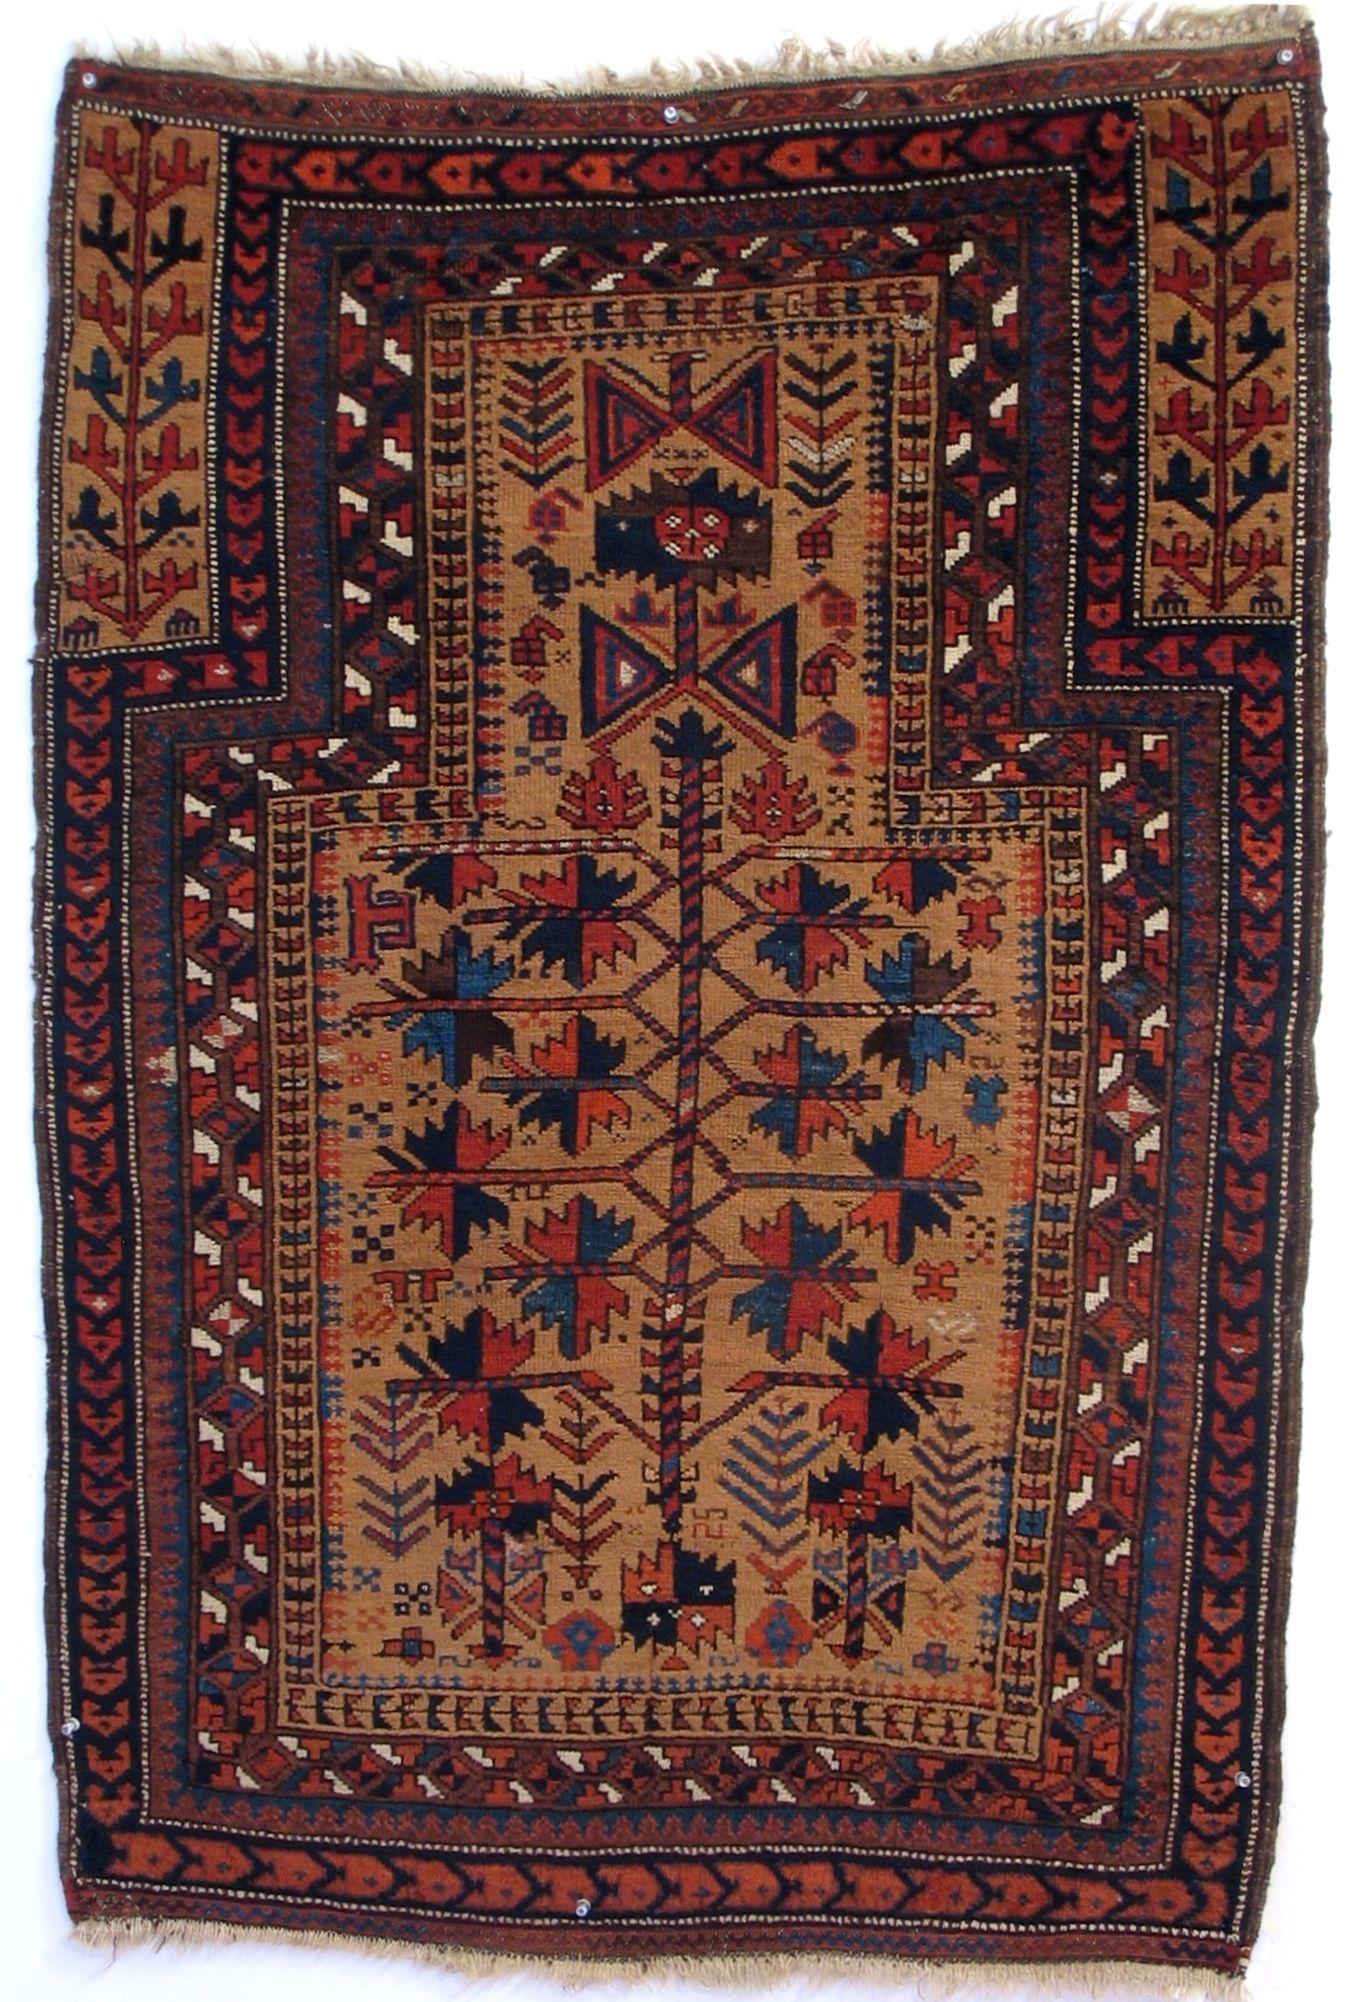 Baluch Prayer Rug Iran Khorasan 2nd Half 19th Century 2 9 X 4